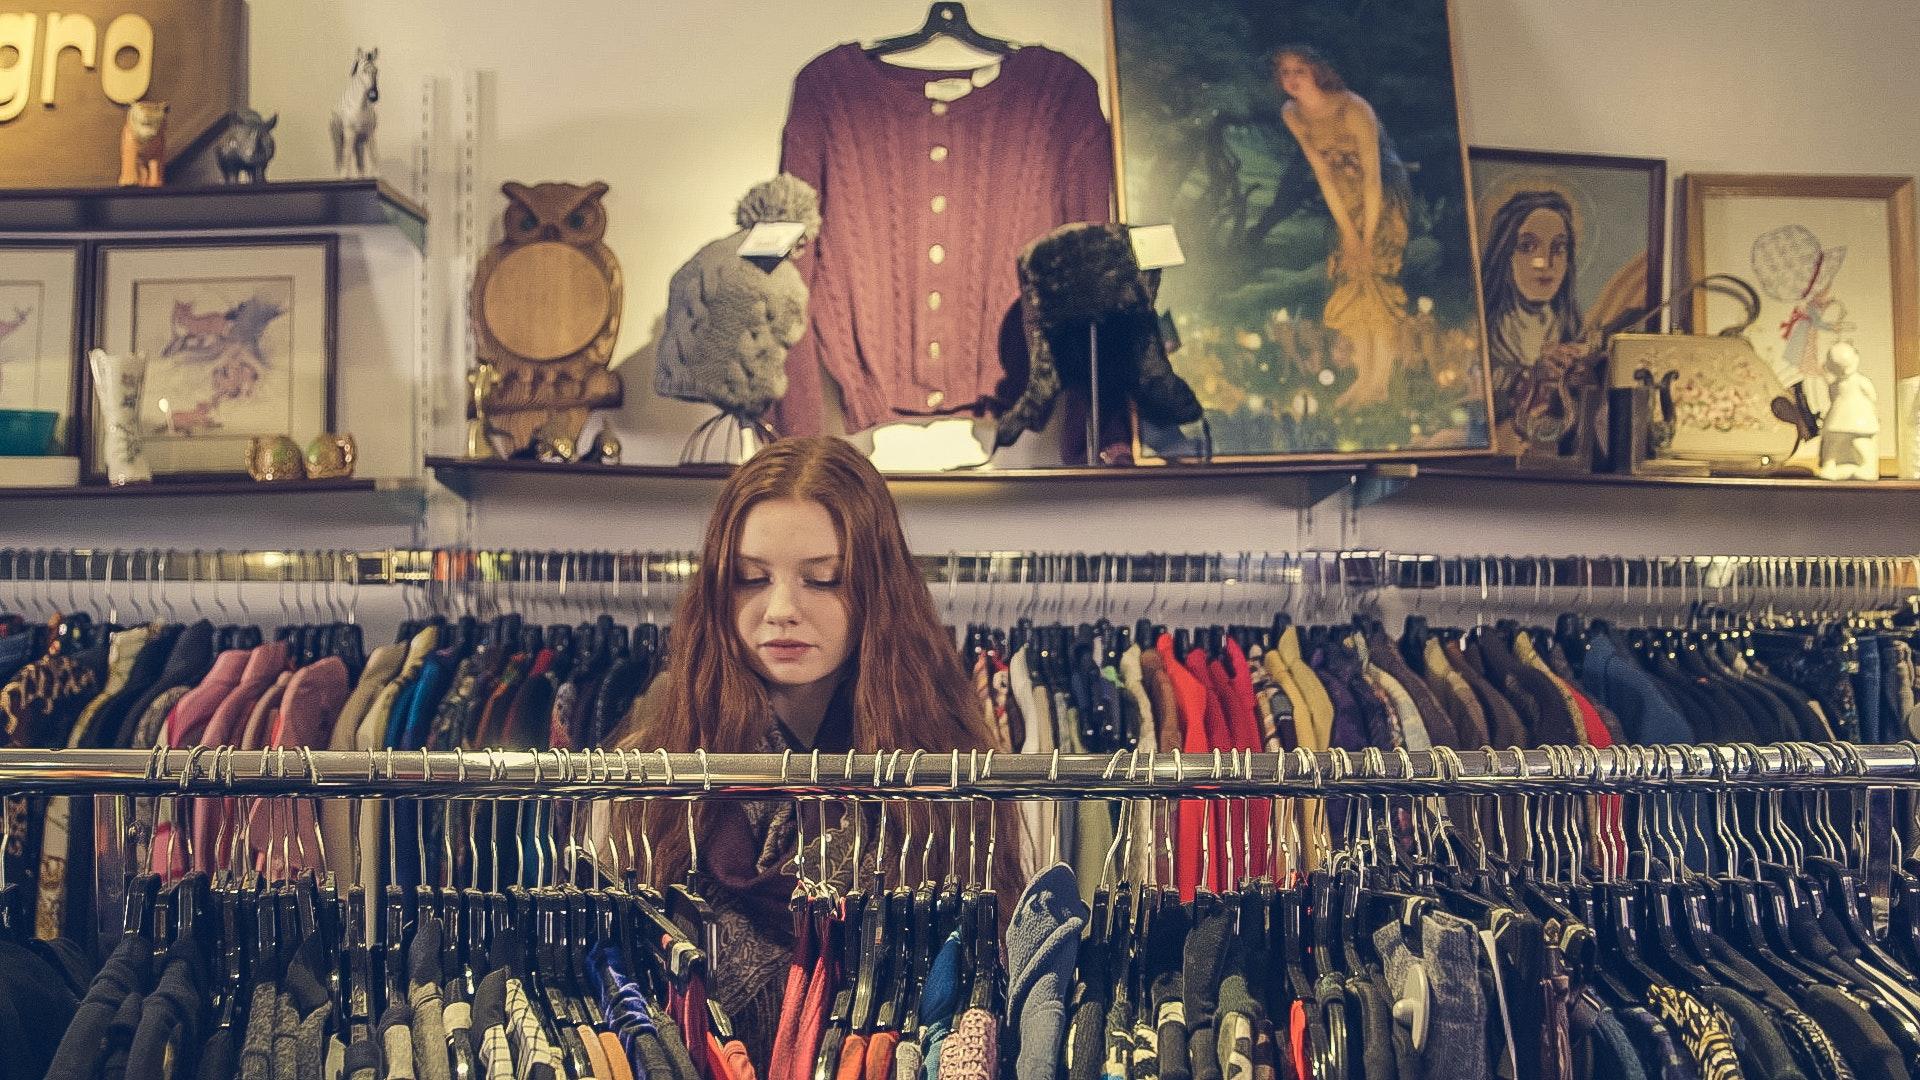 c5ca1bbcc51 500+ Great Clothes Photos · Pexels · Free Stock Photos